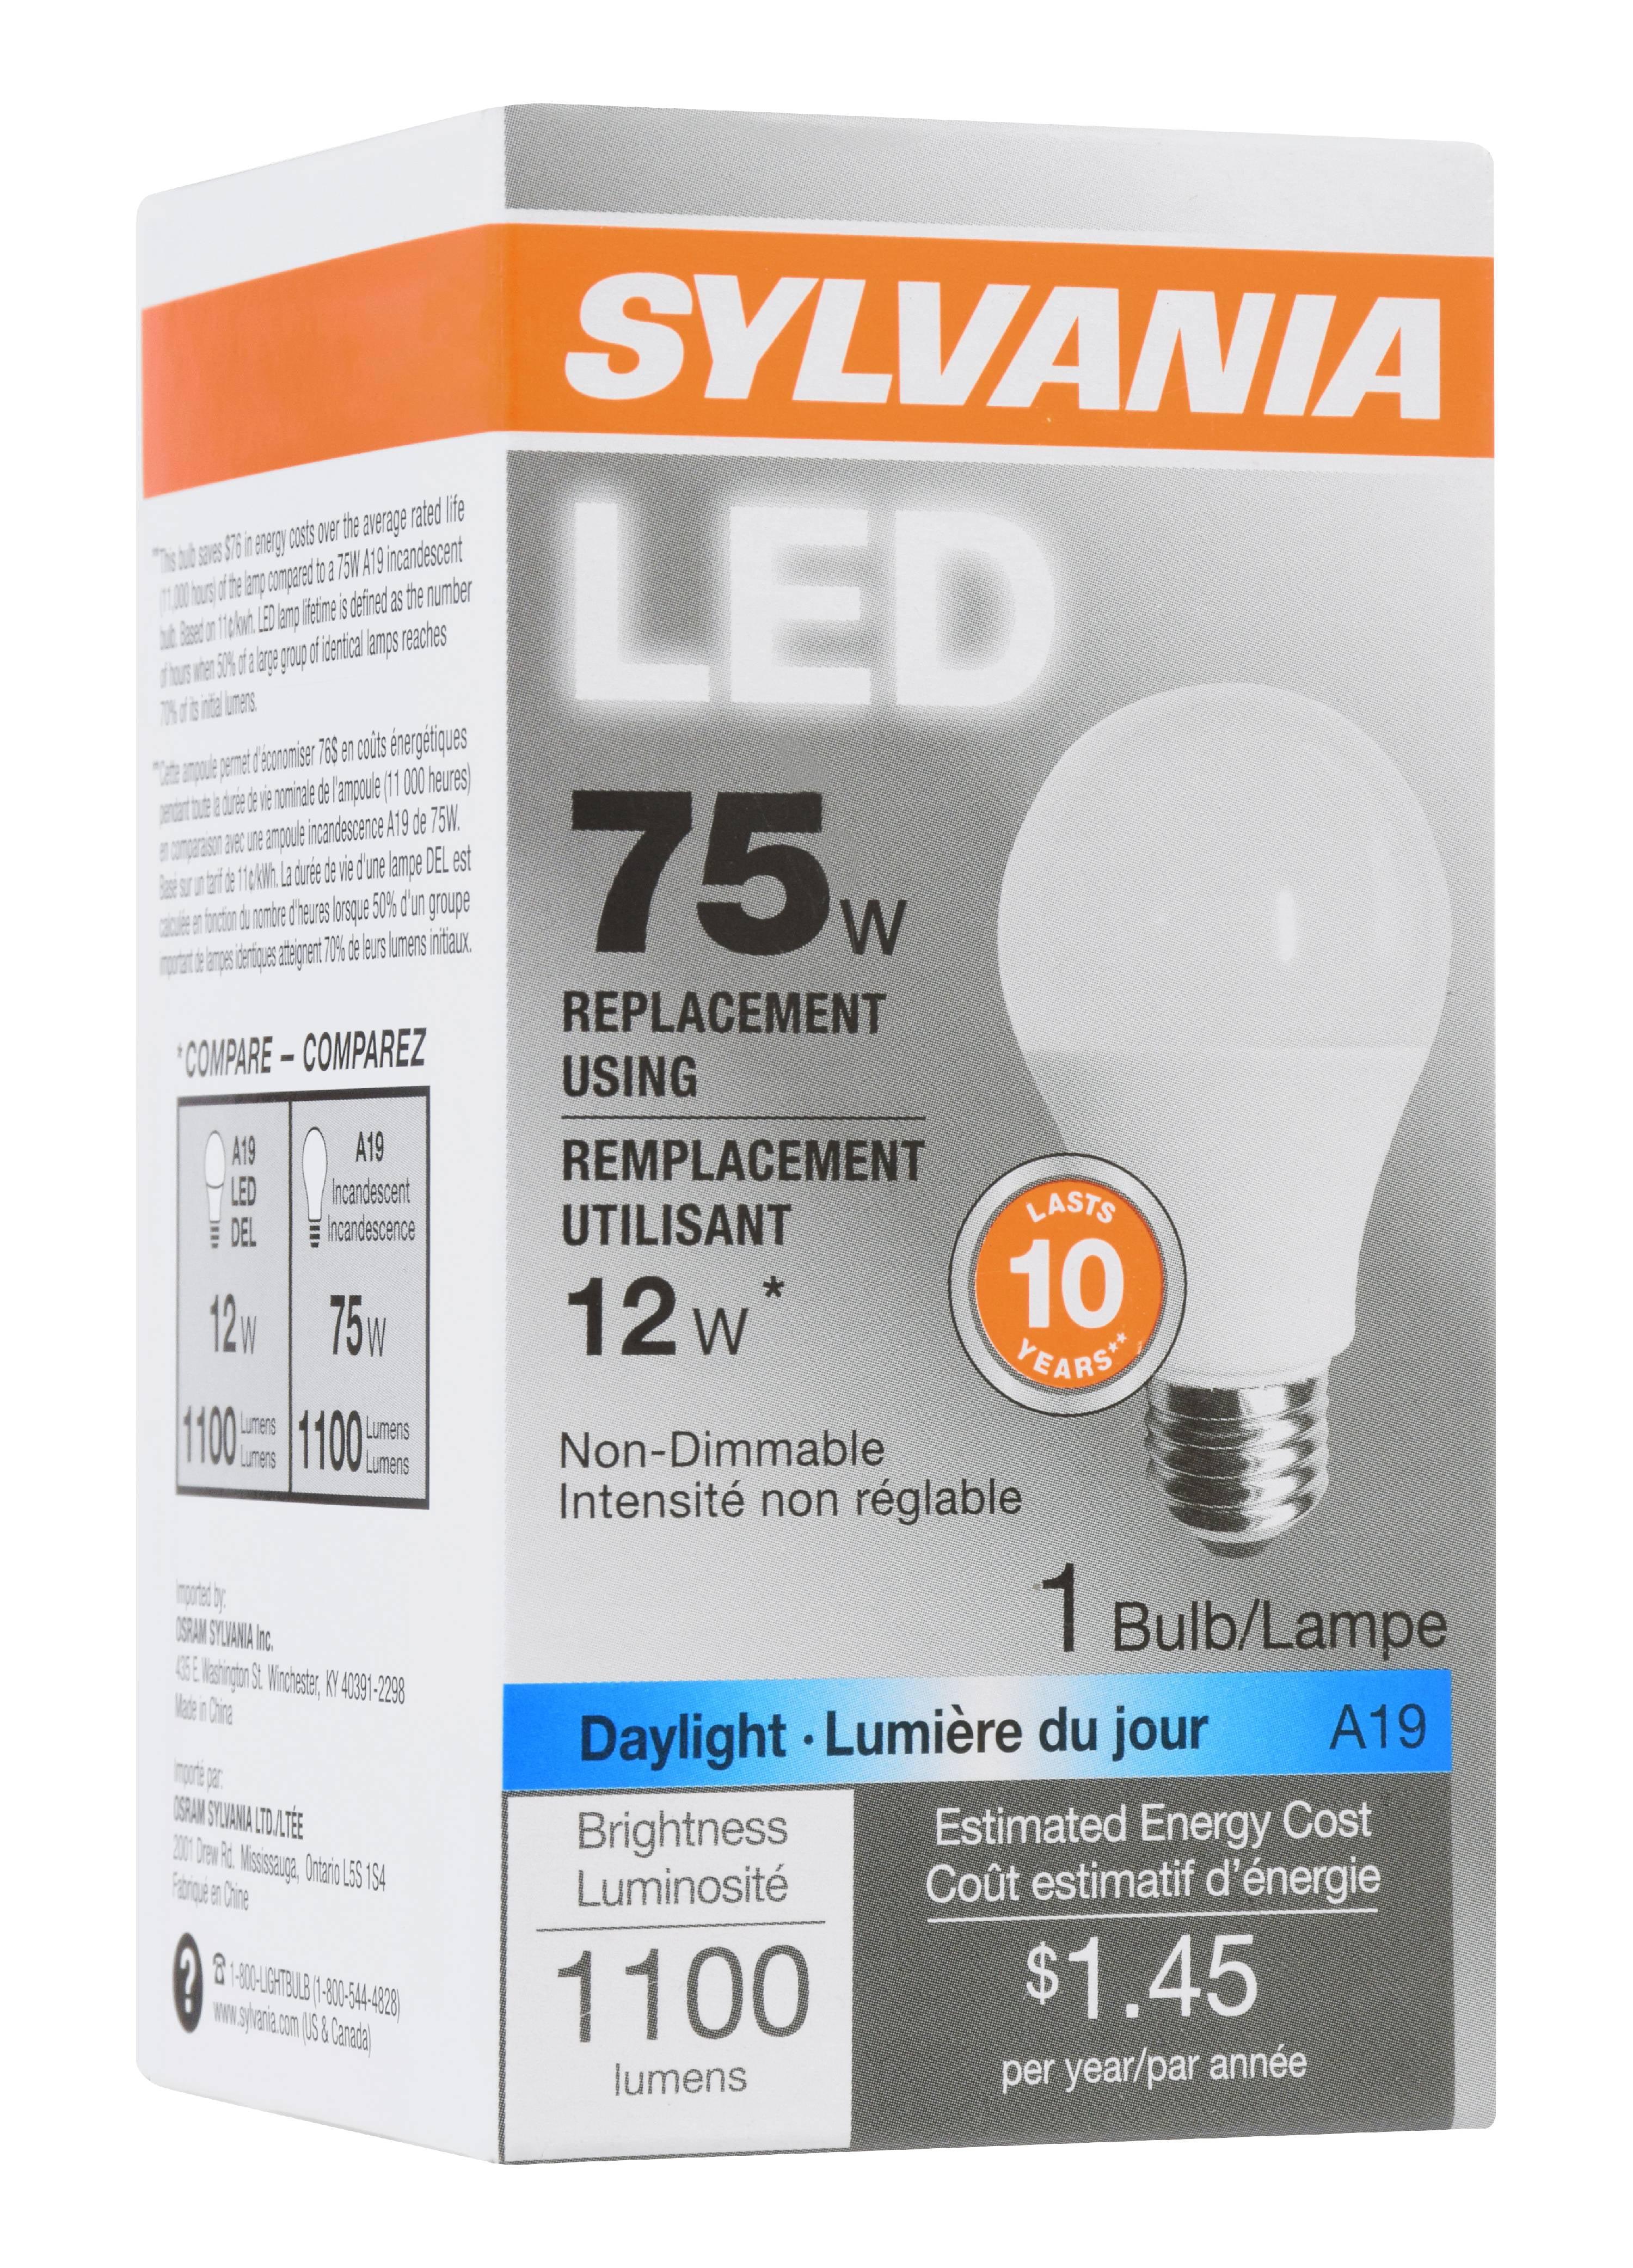 Led Light Bulb Daylight: Sylvania LED Light Bulb, 12W (75W Equivalent), Daylight, 1